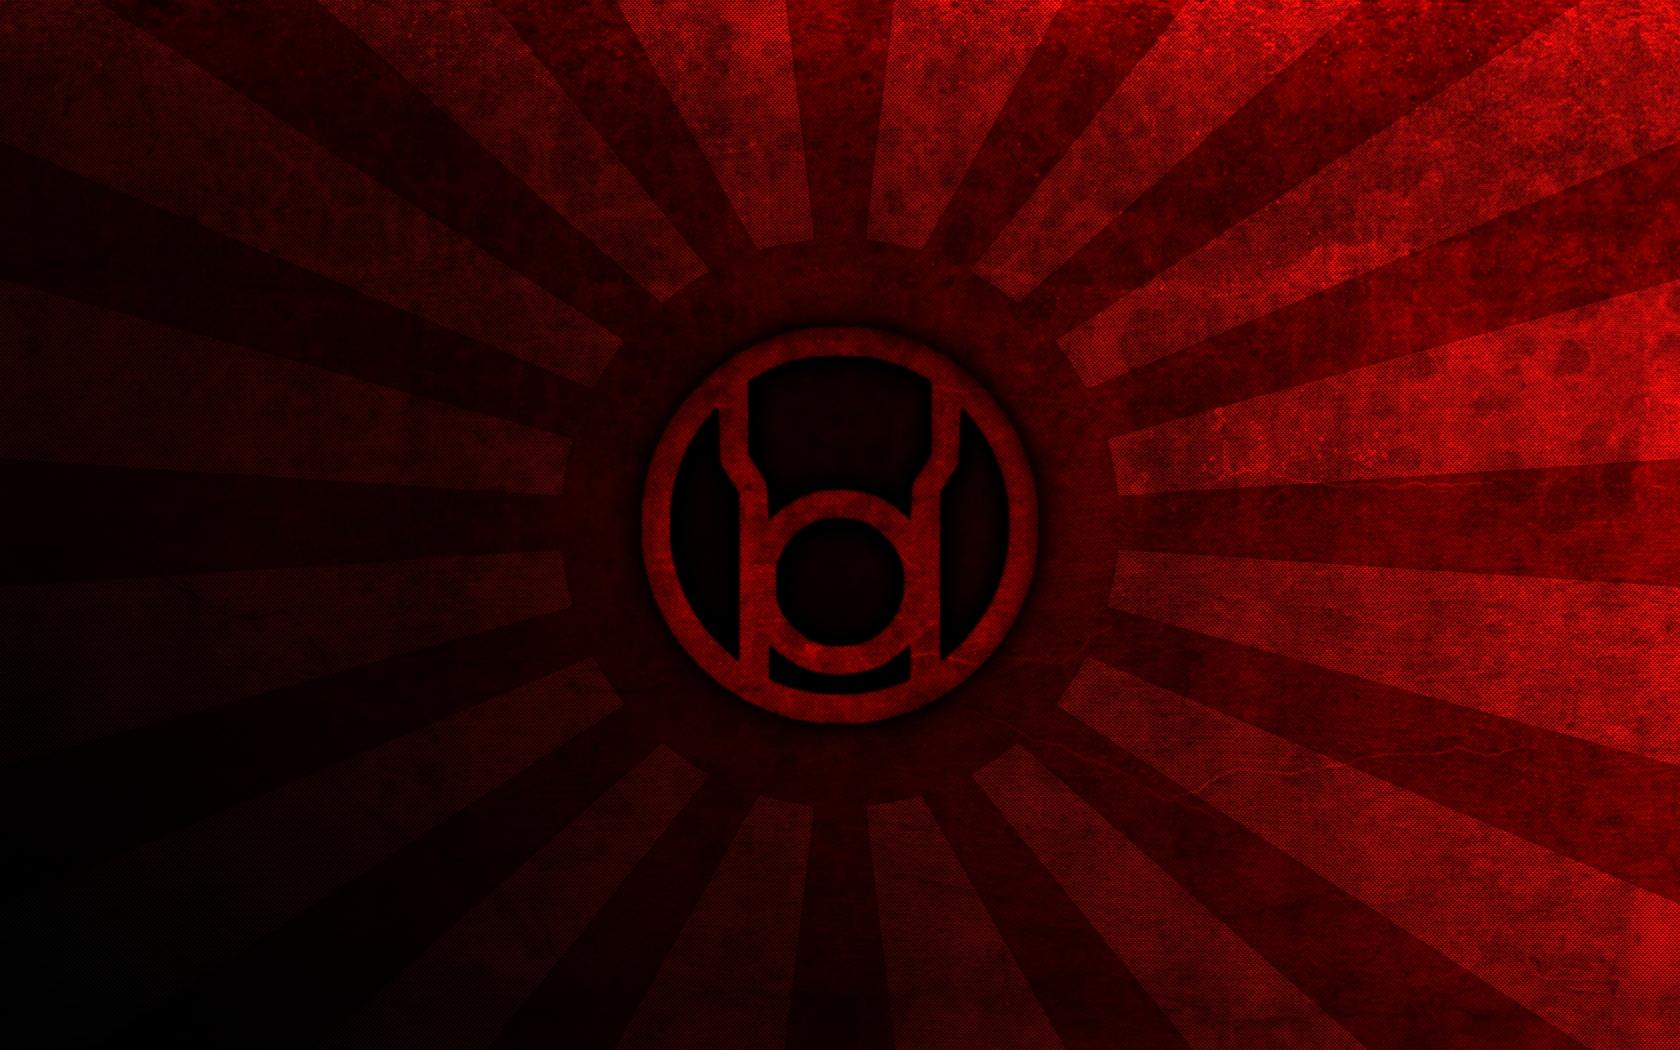 Red Lantern Wallpaper by LordShenlong